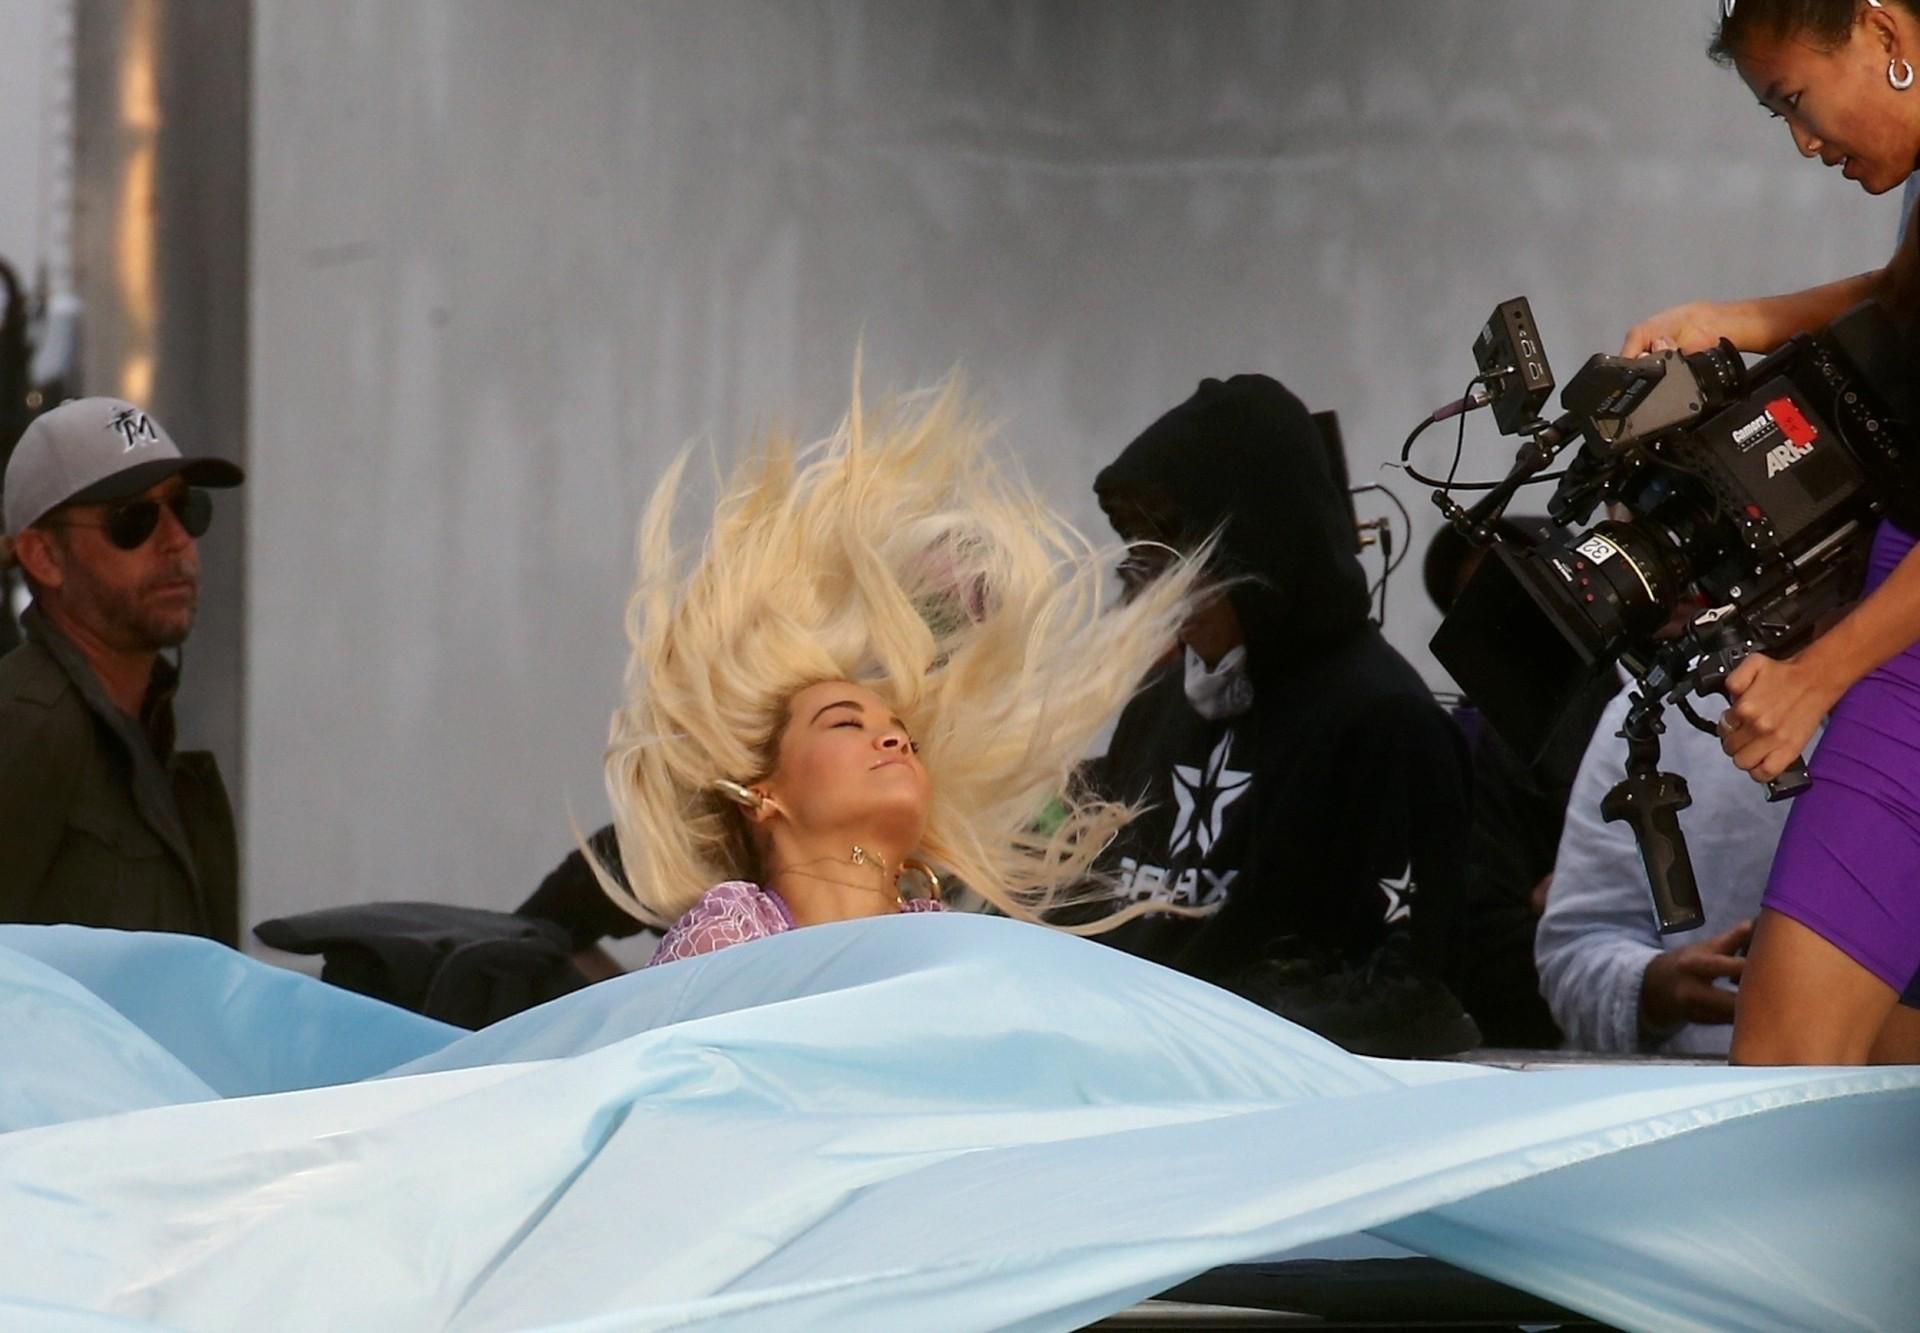 Rita Ora See Through Outfit